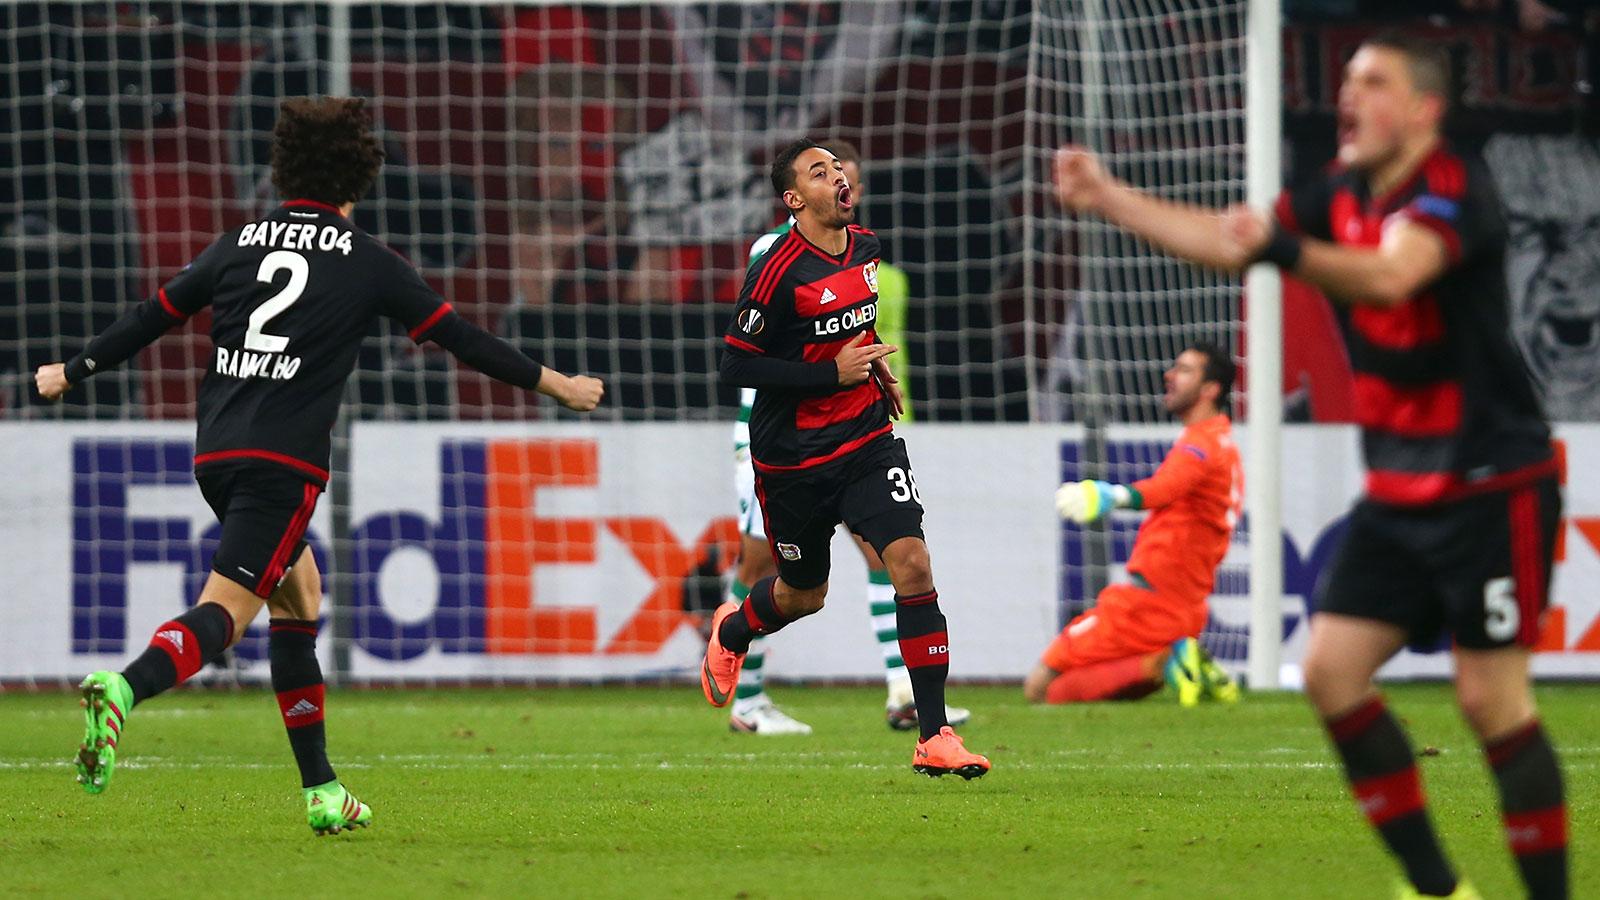 Bayer Leverkusen's Karim Bellarabi scores preposterous 30-yard wonder goal